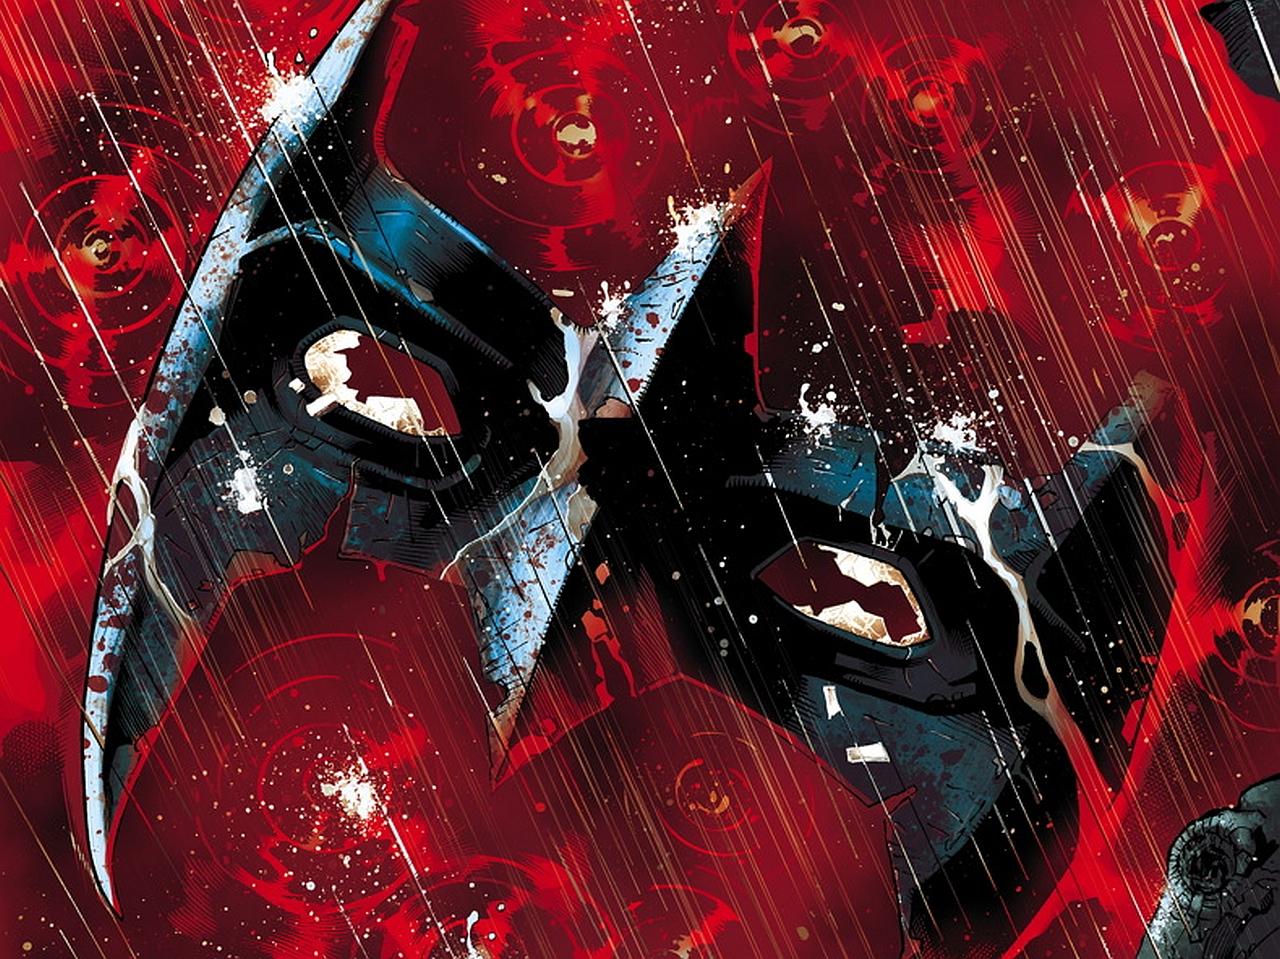 Nightwing New 52 Wallpaper 1920x1080 Comics   nightwing wallpaper 1280x959